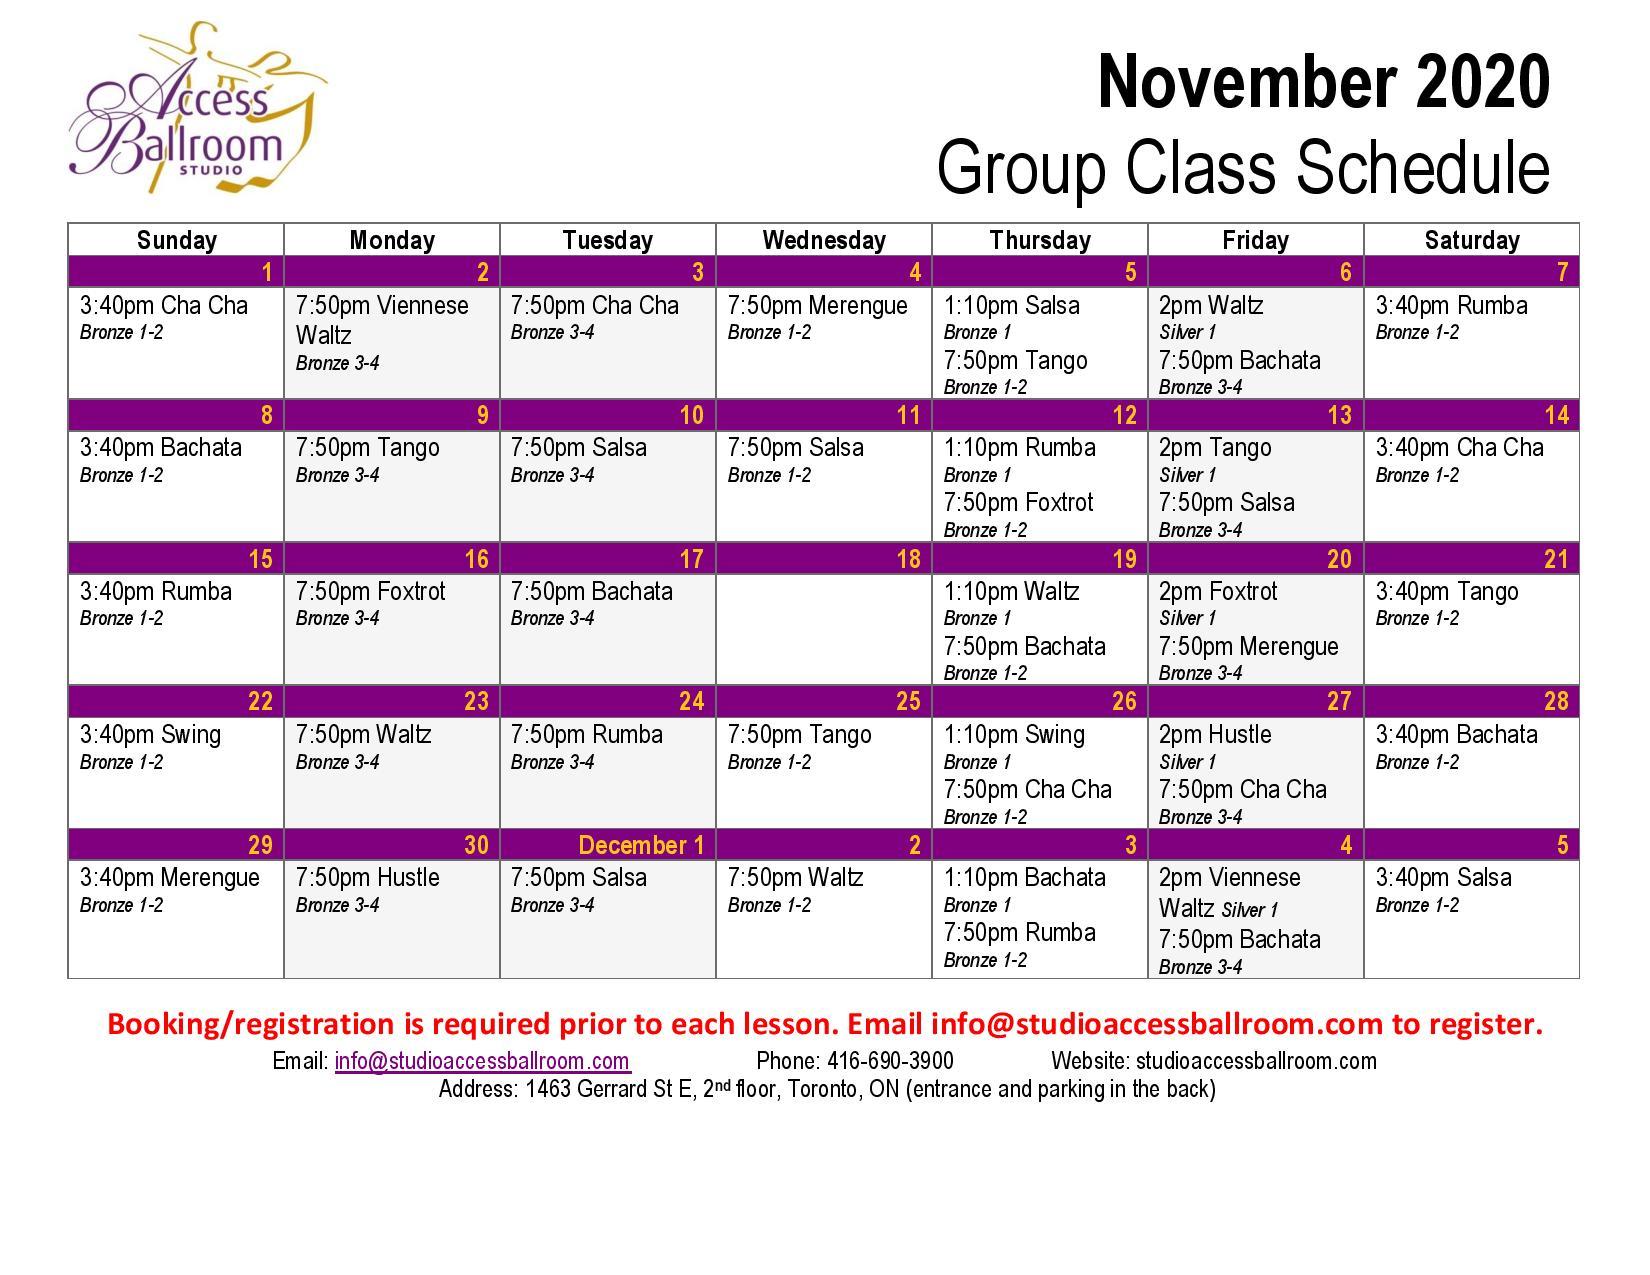 Access Ballroom november 2020 schedule